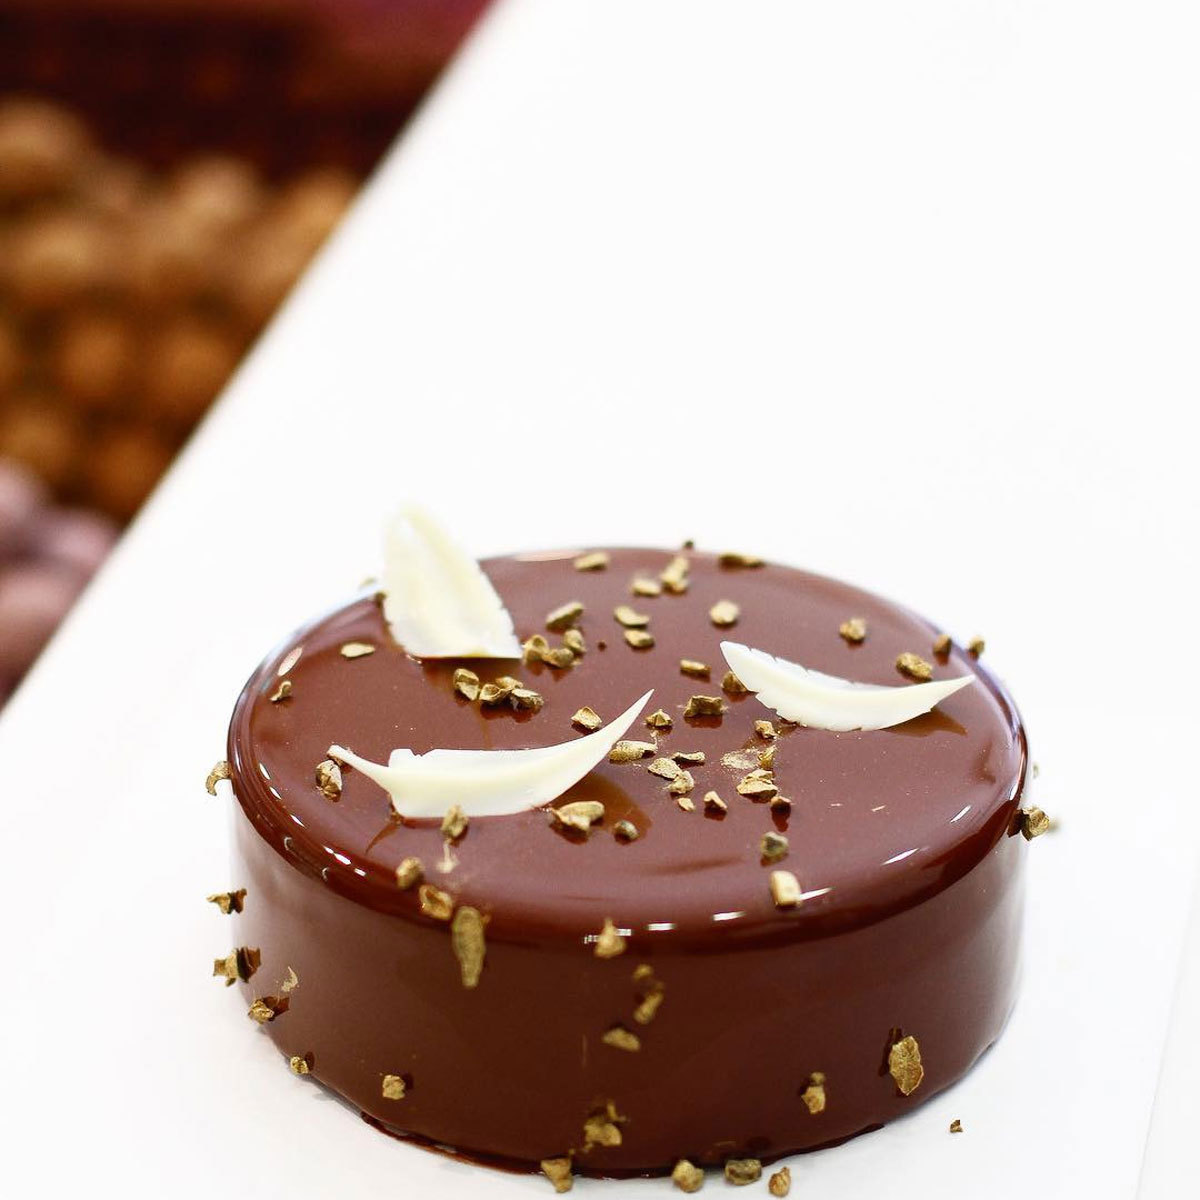 mejores postres chocolate madrid